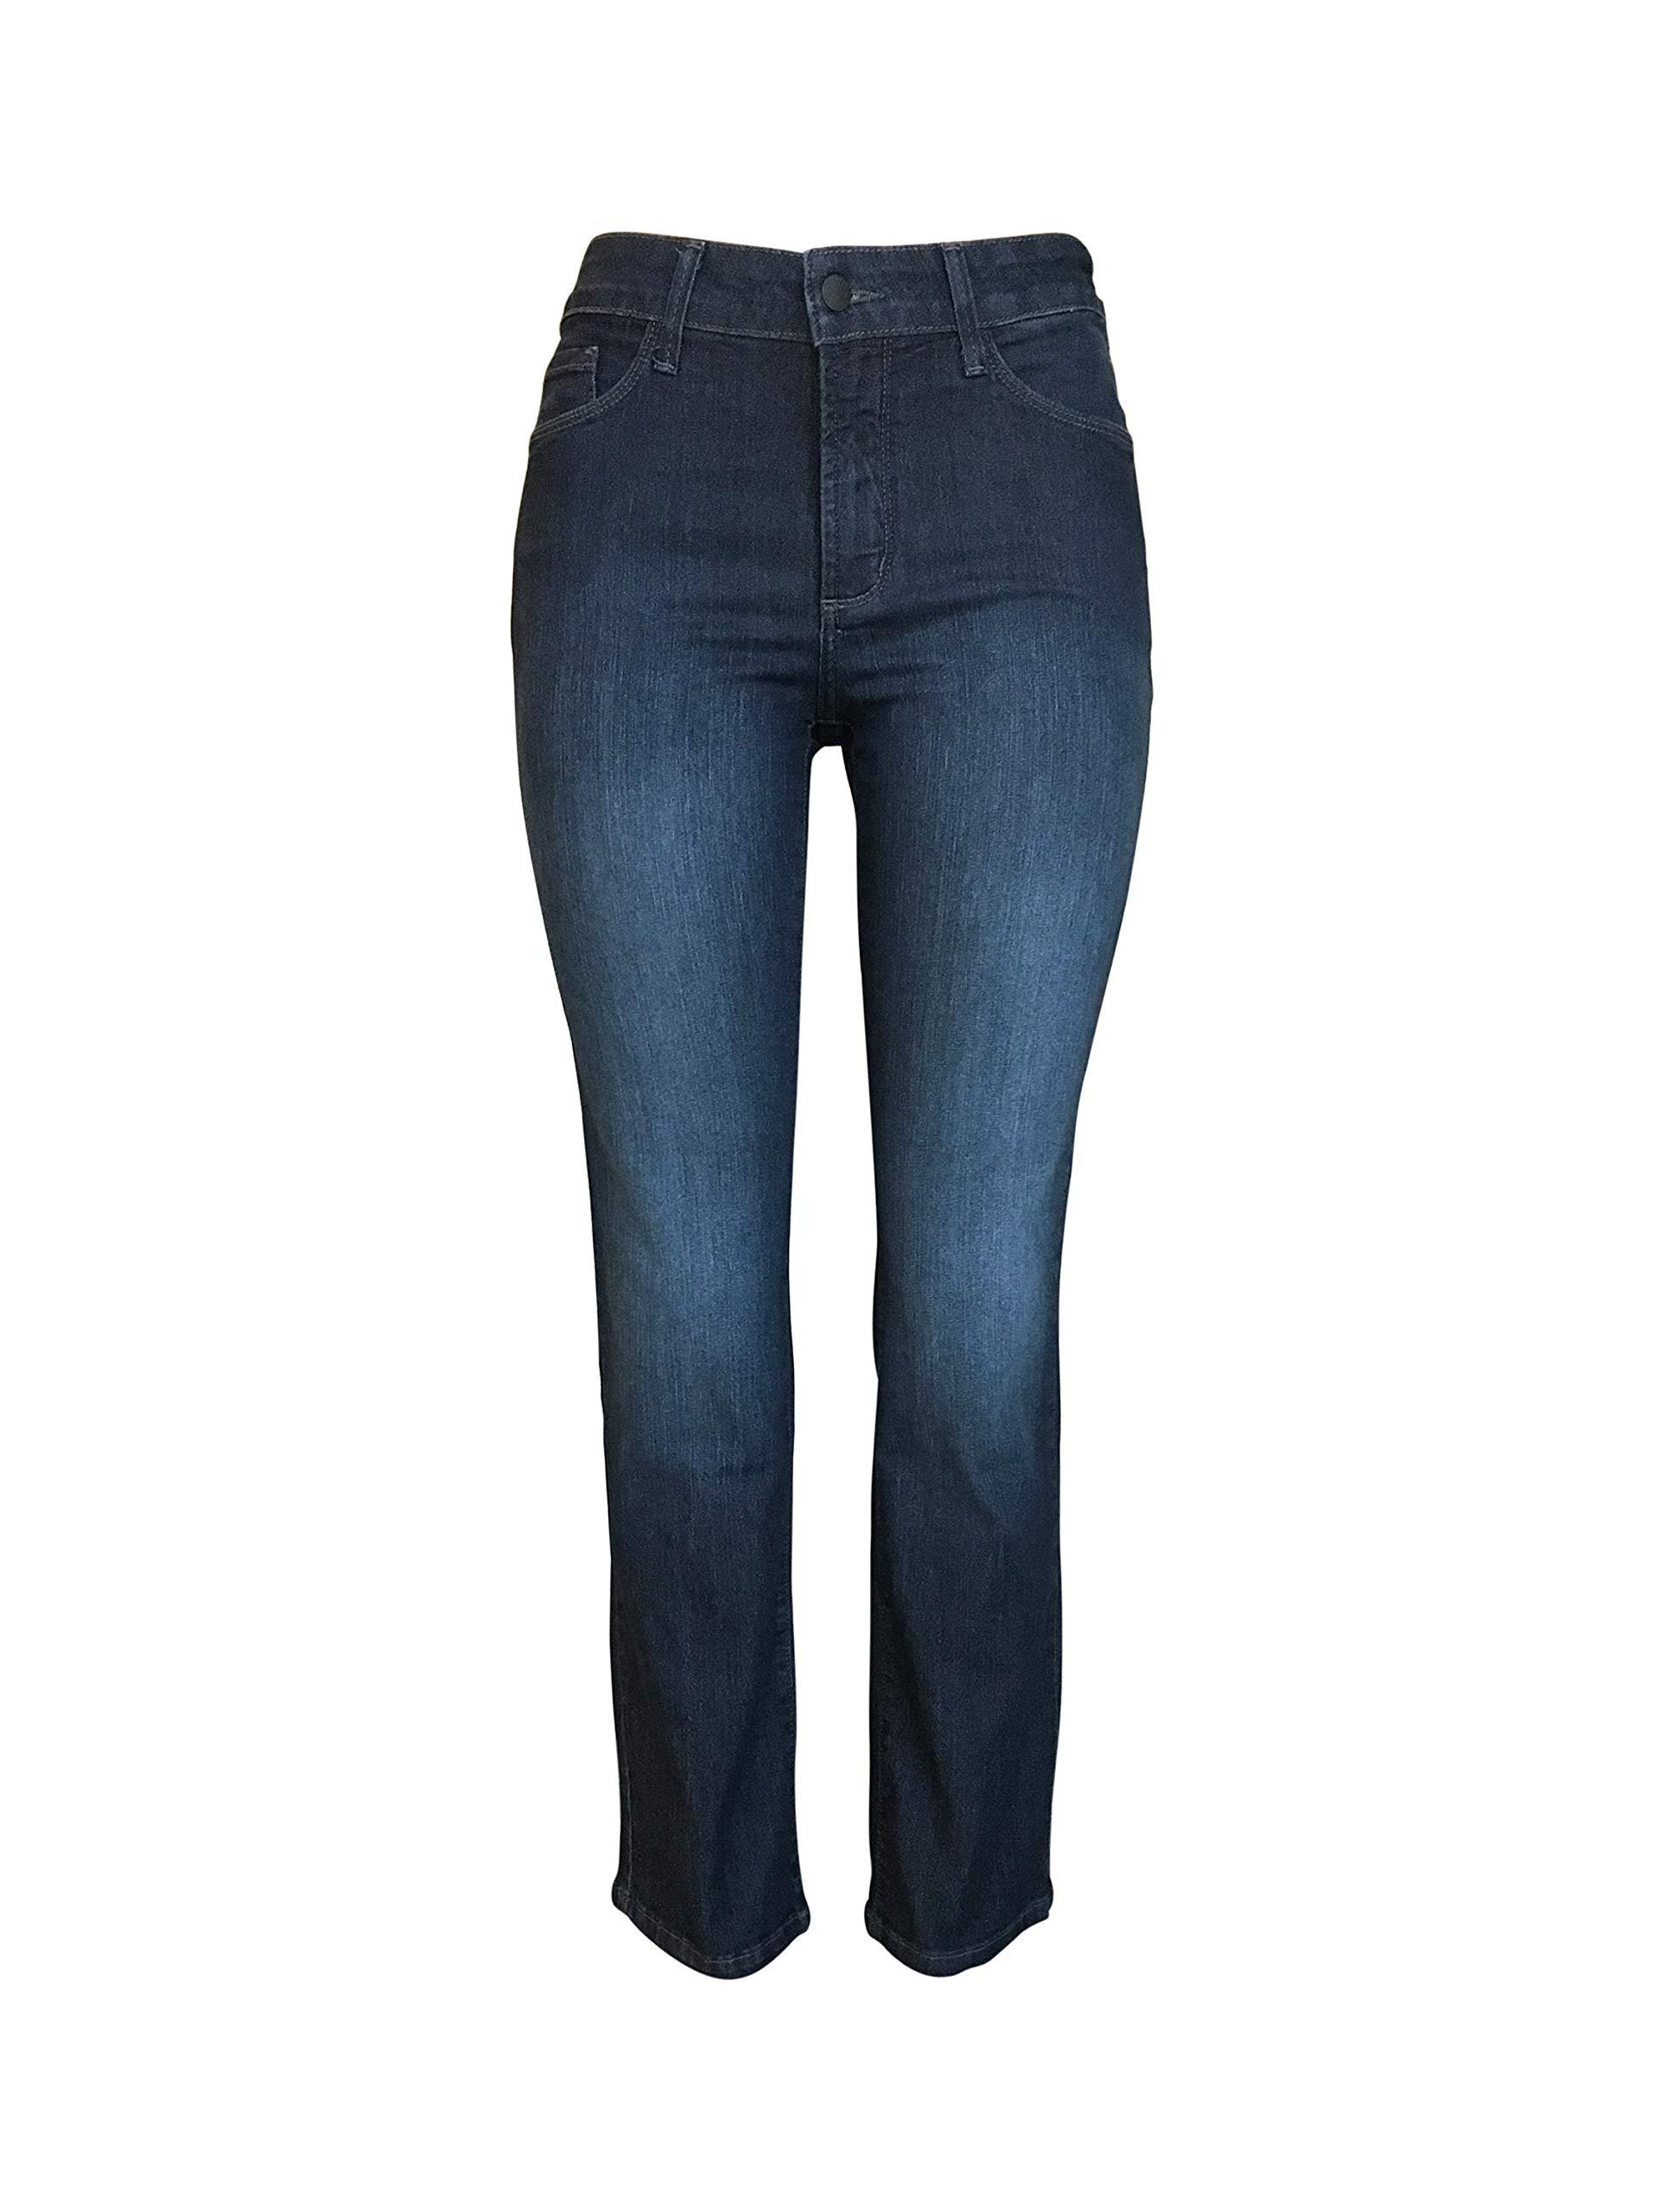 NYDJ Women's Marilyn Straight Fit Pant Soft Stretch